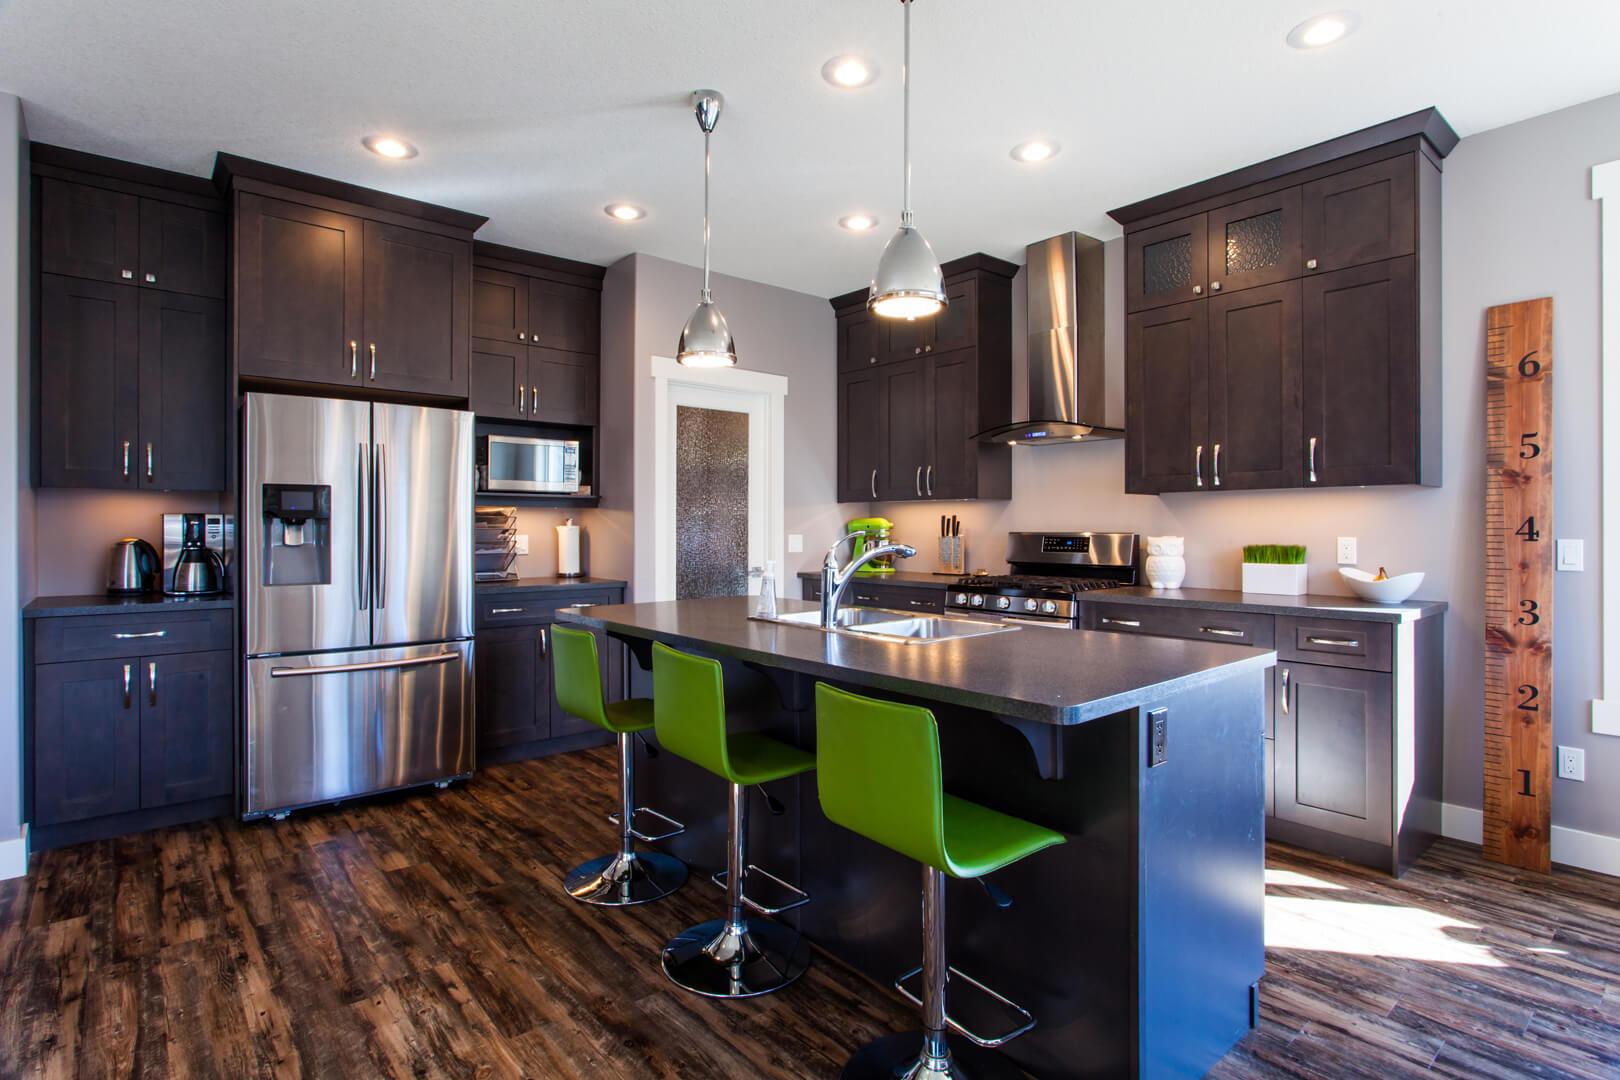 brady_rococo-homes_kitchen